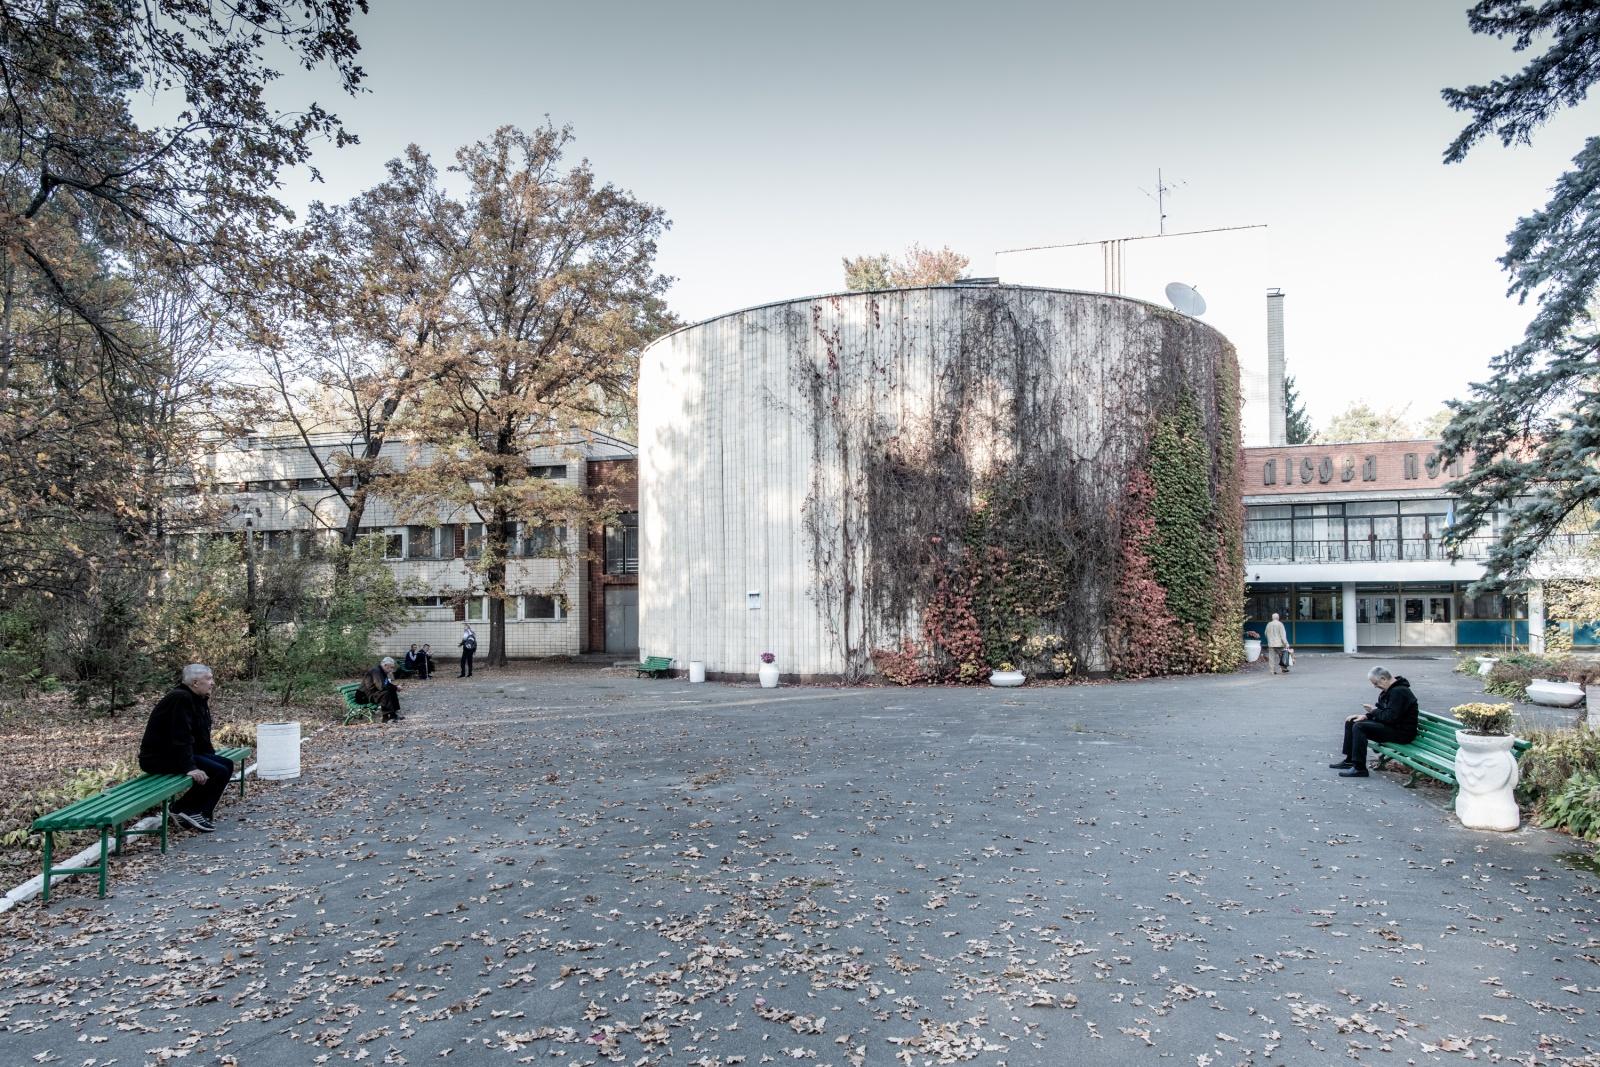 Puscha Voditsa, Ukraine (2019). The veterans hospital